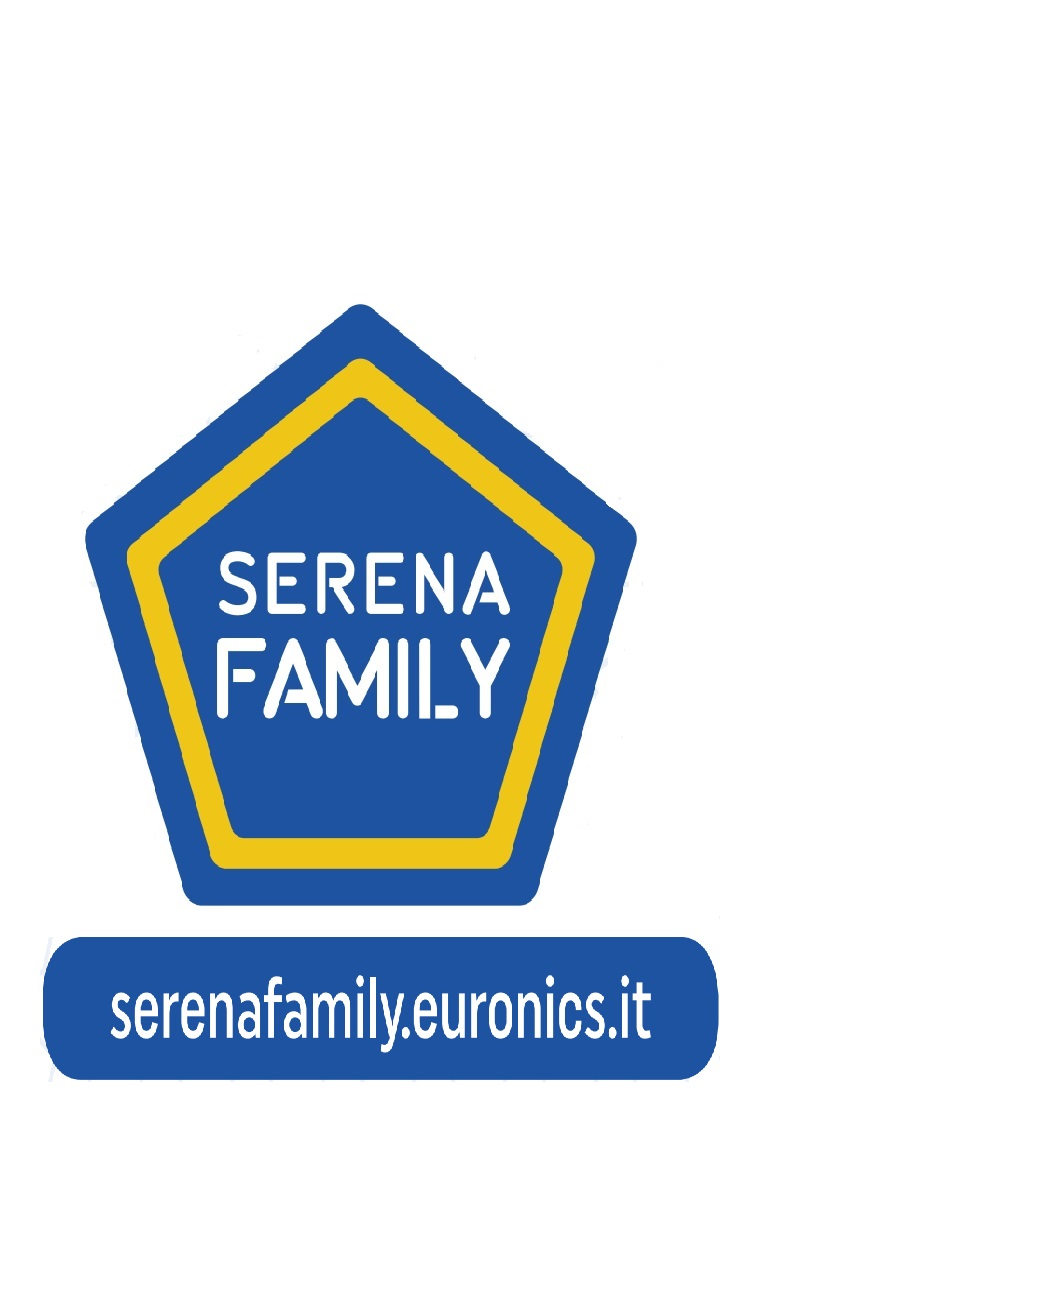 Serena Family